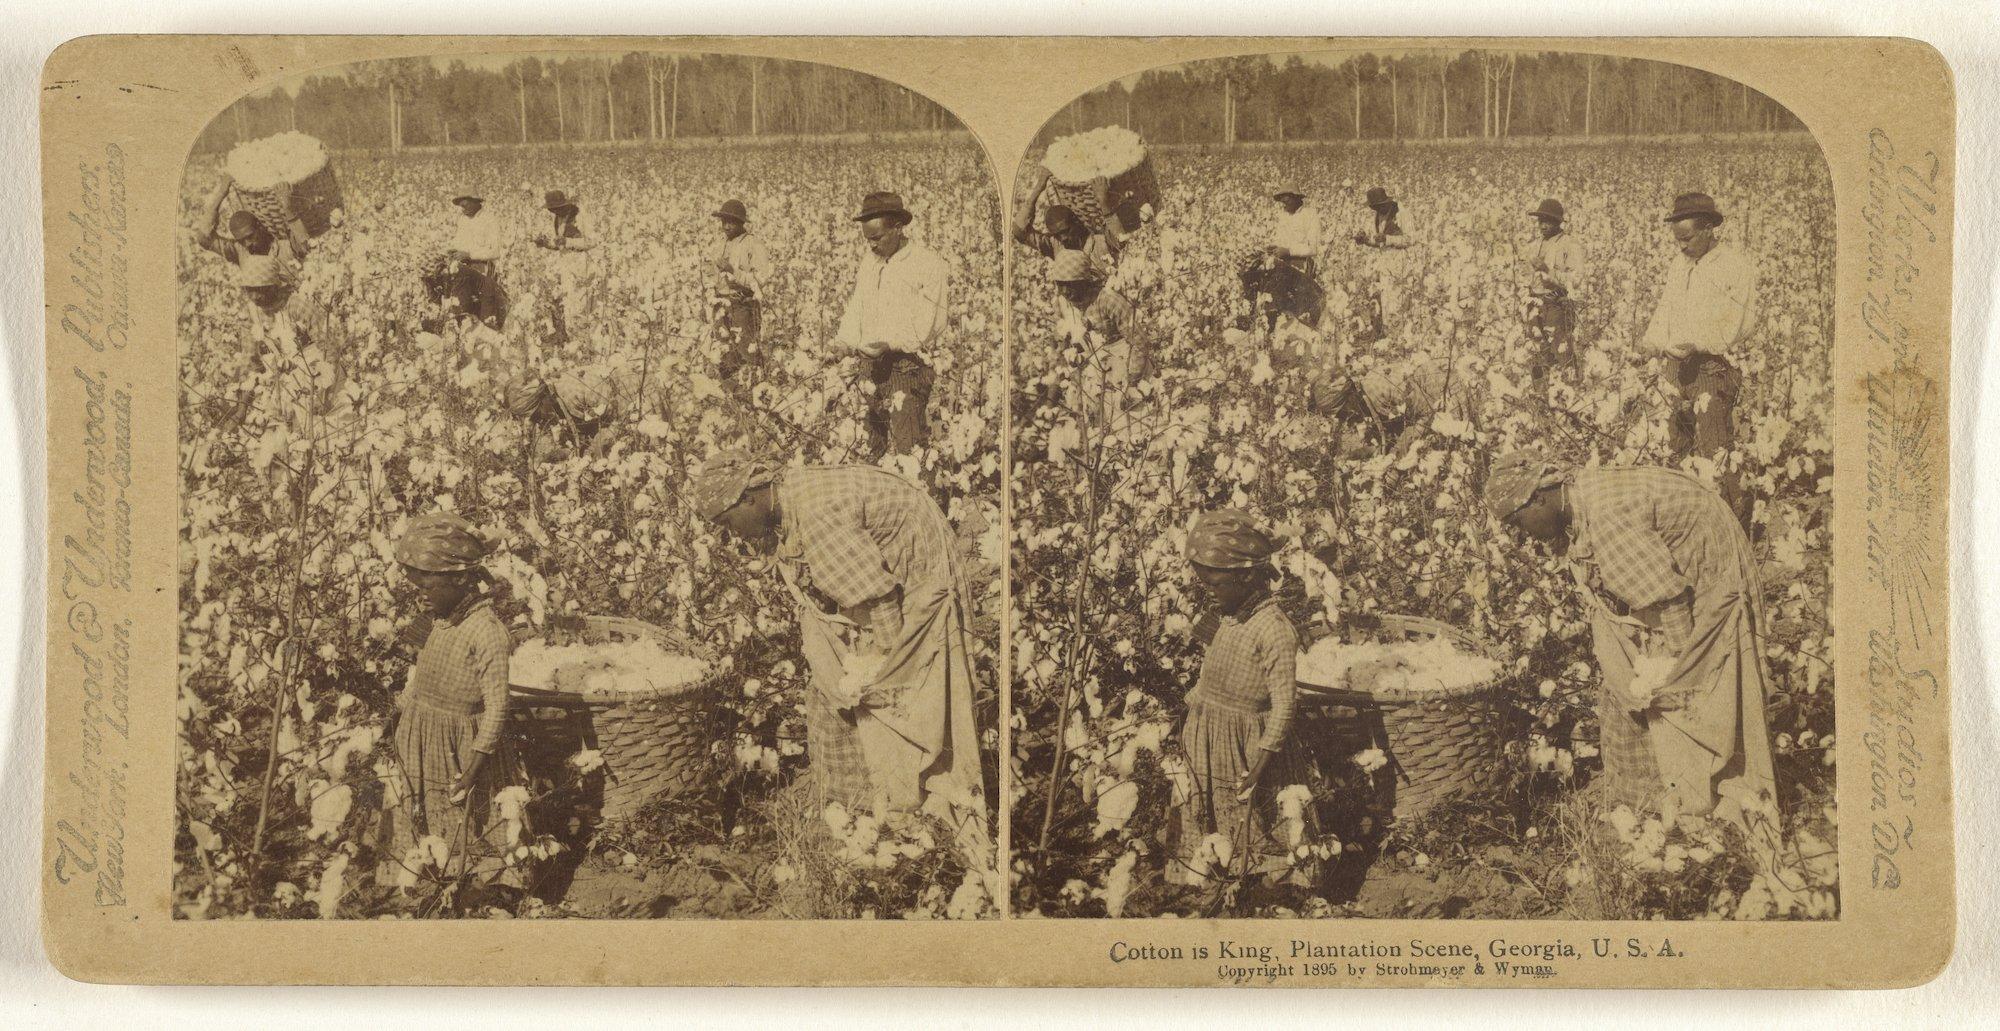 Photograph of a cotton plantation